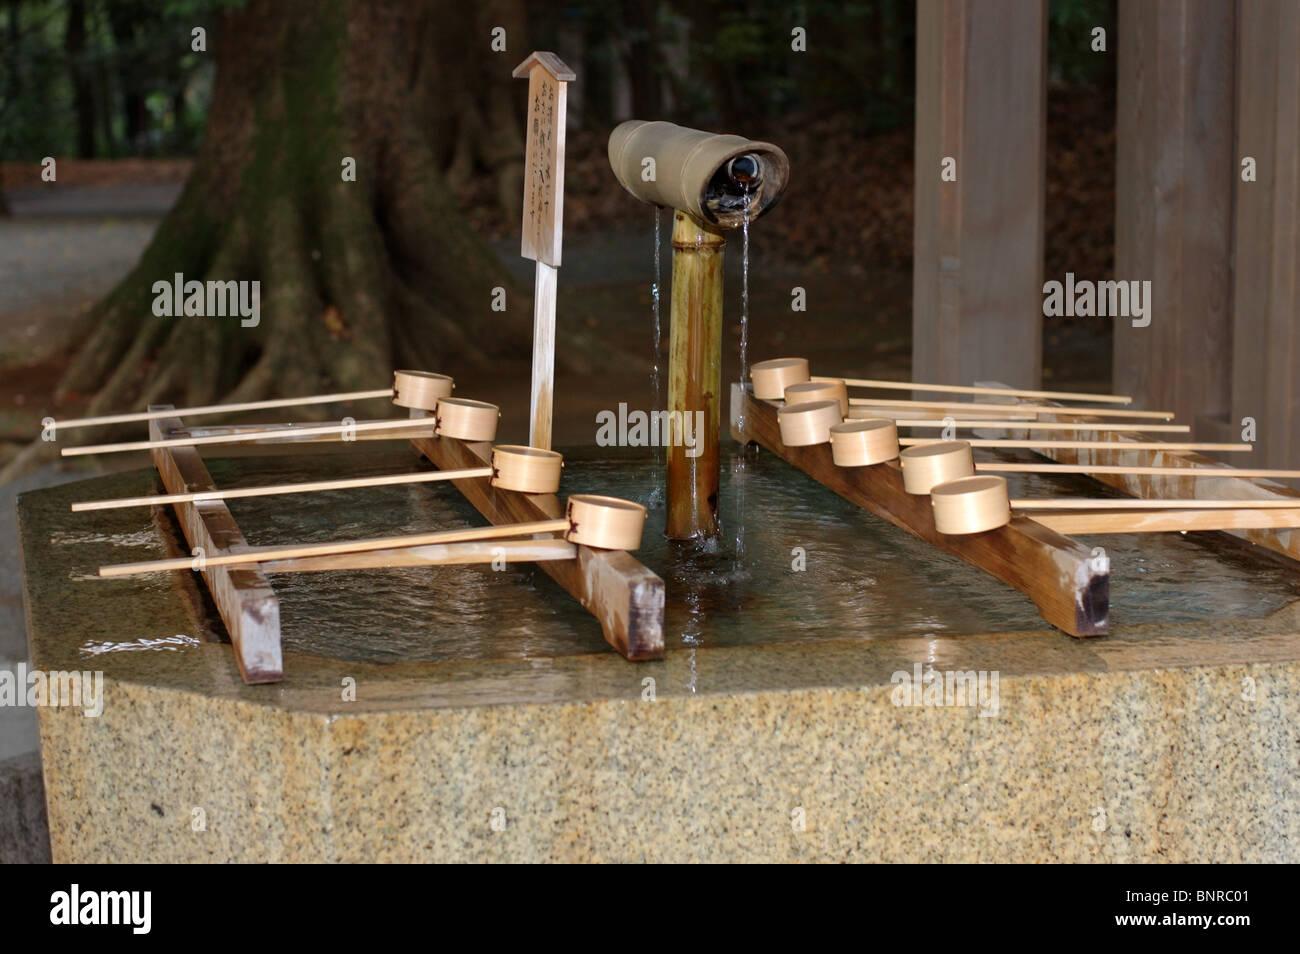 Use a bamboo ladle hishaku to cleanse your body and mind before entering Meiji Jingu, a Shinto shrine. Tokyo, Japan. - Stock Image